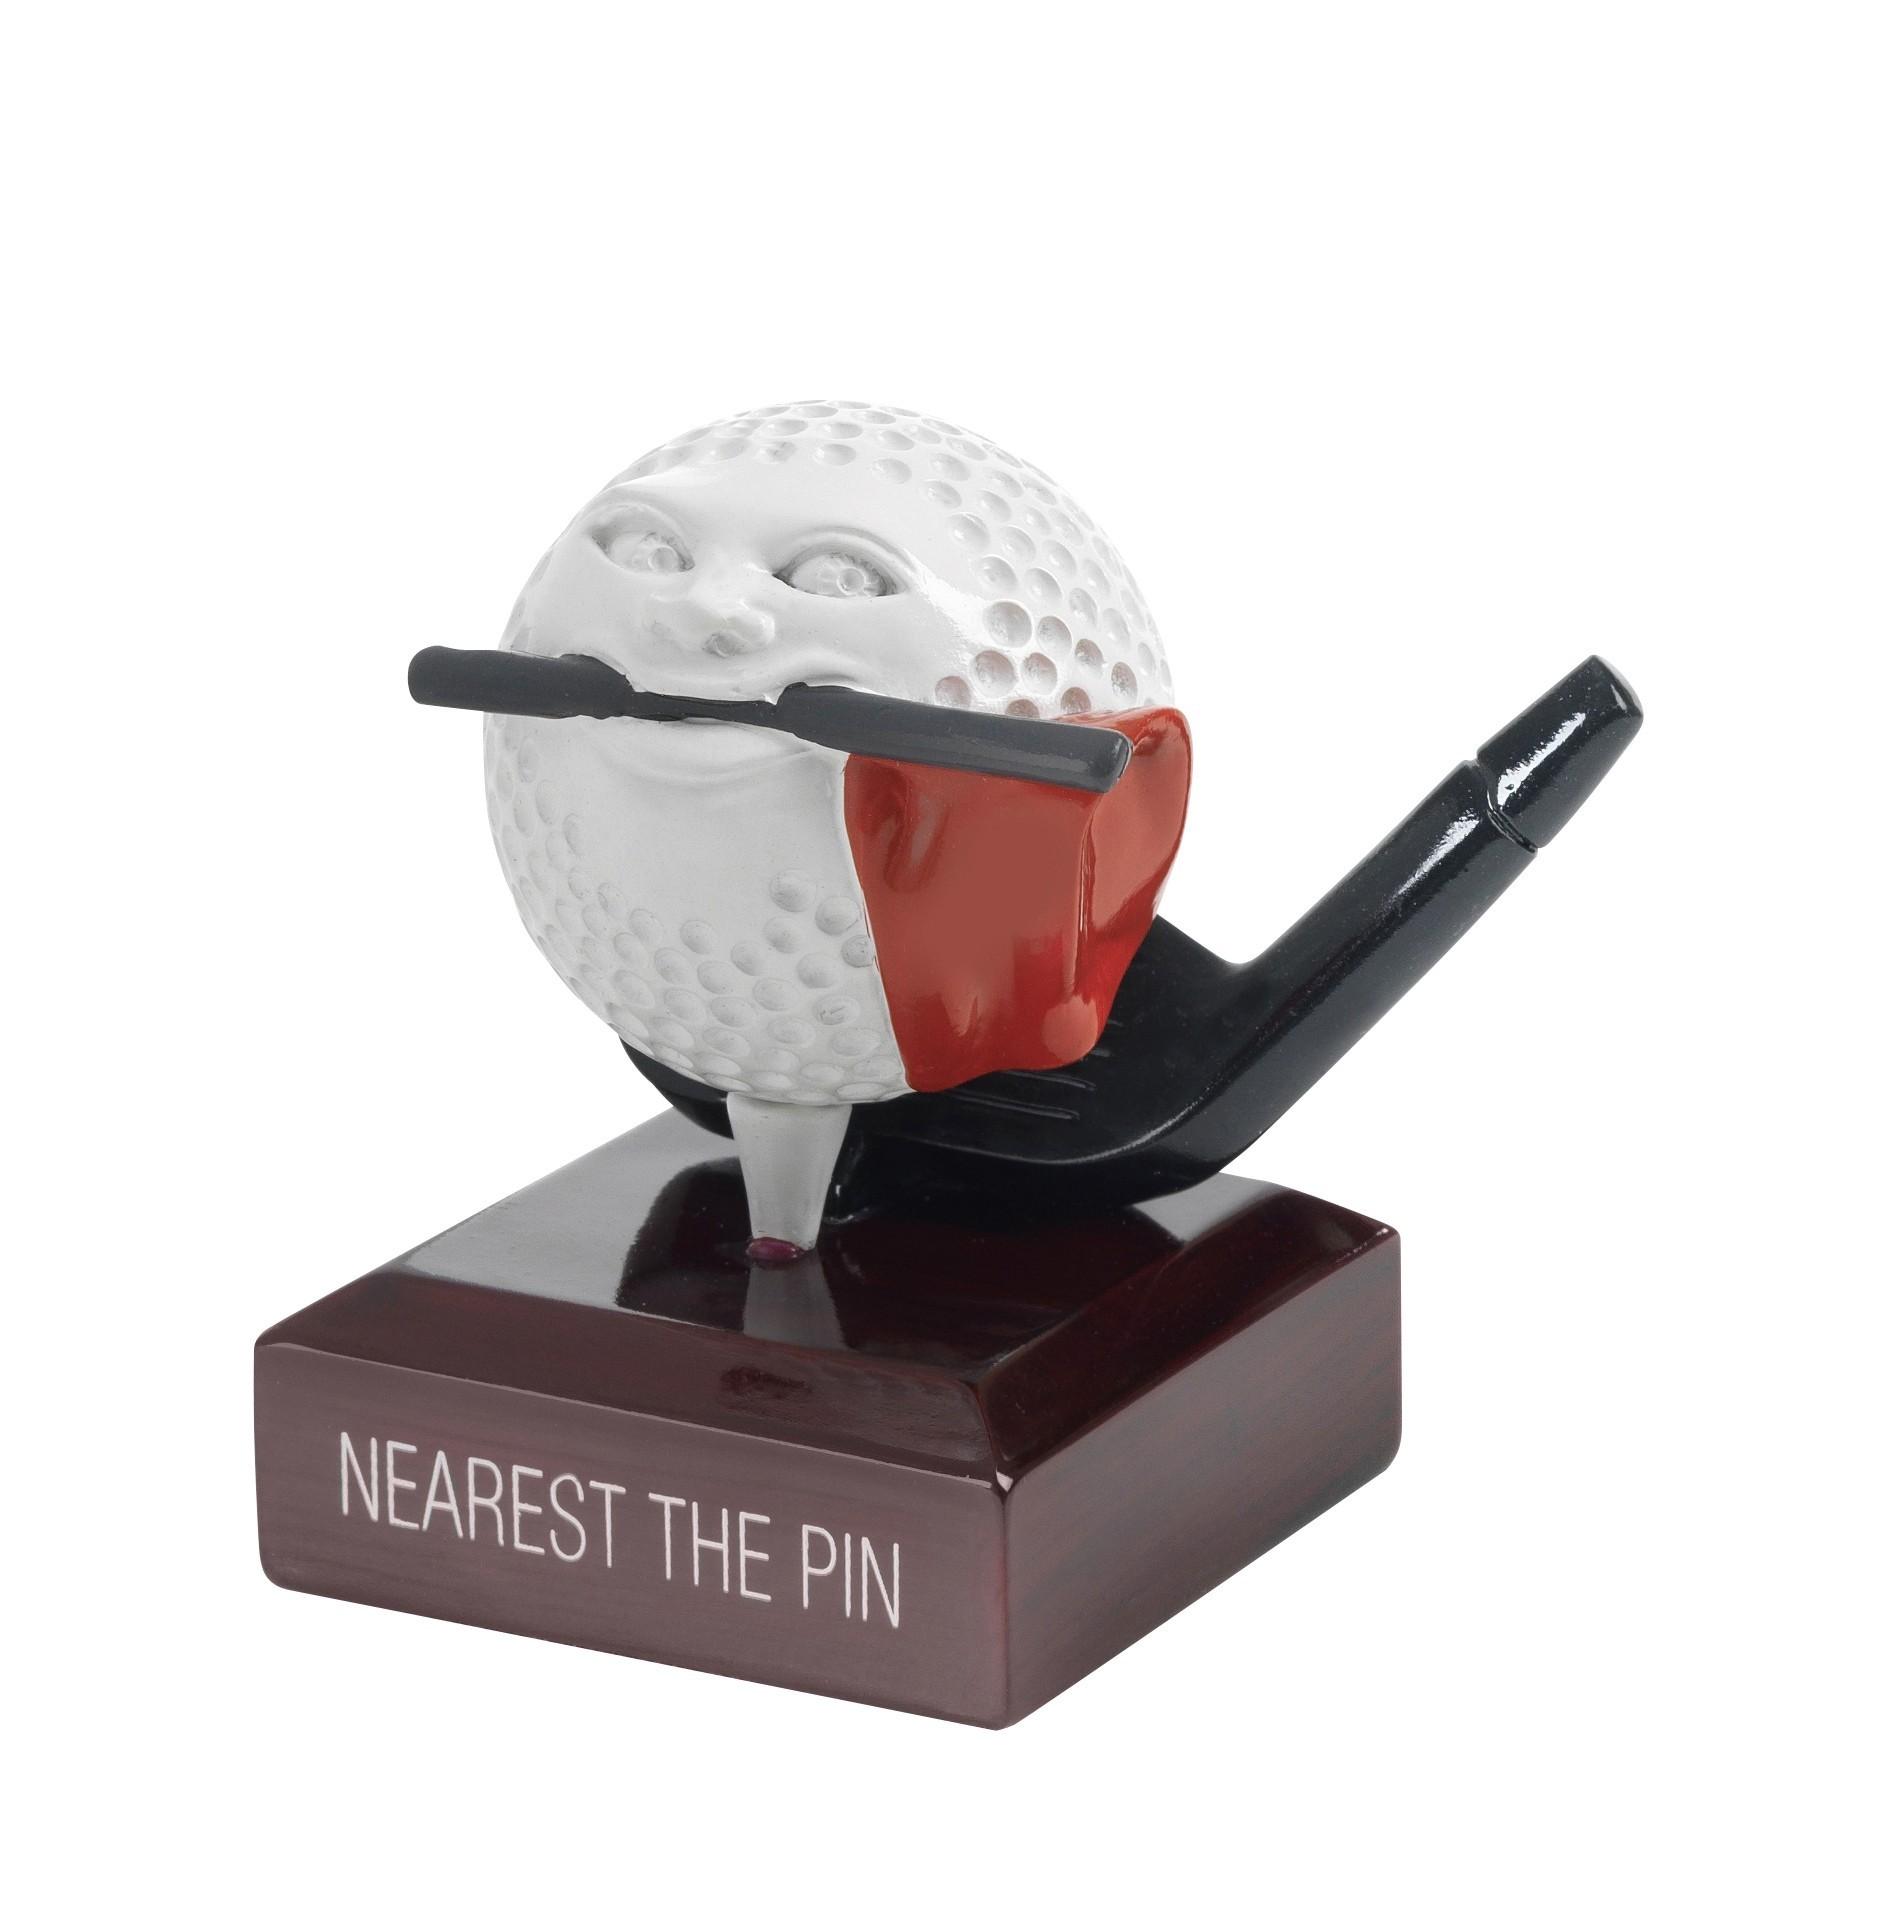 9.5cm Nearest the Pin